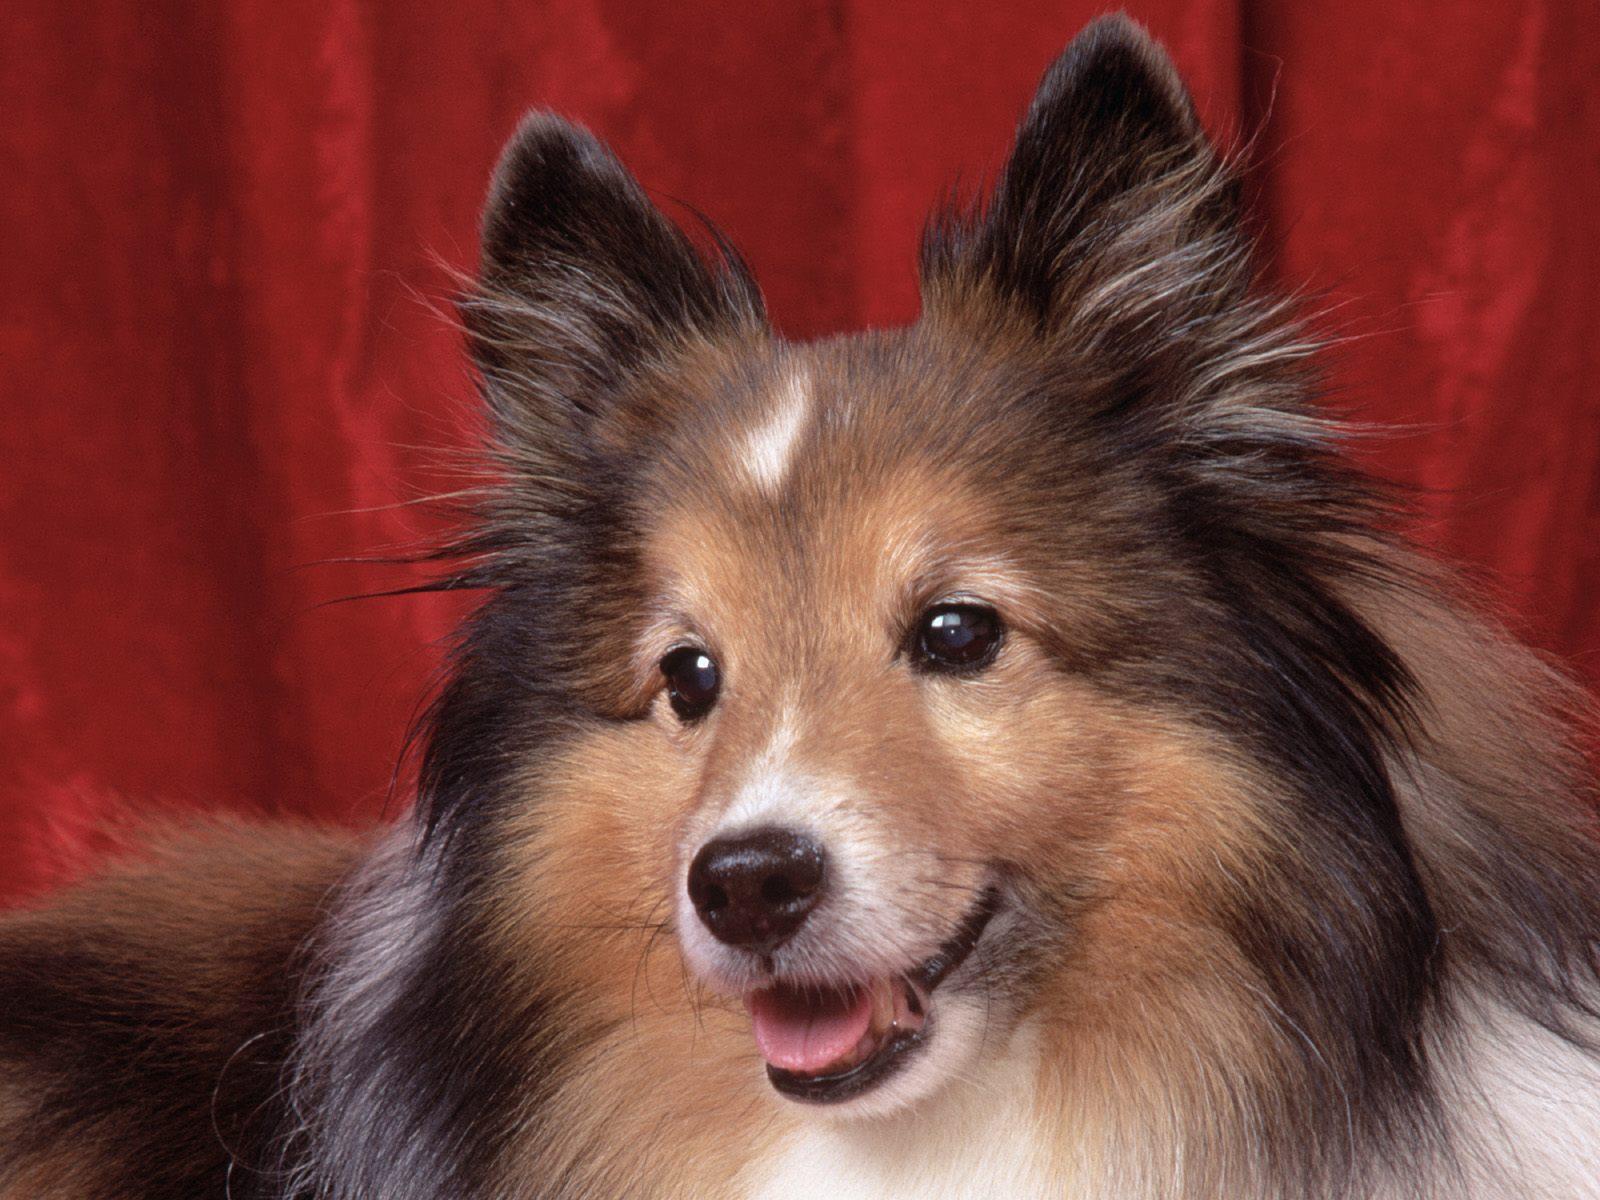 http://4.bp.blogspot.com/-QDcwoSDZ7lM/Tp-3hM8qYuI/AAAAAAAAAg4/LX7GnrCNdDE/s1600/Cute-Dog-Lovely-Picture.jpg